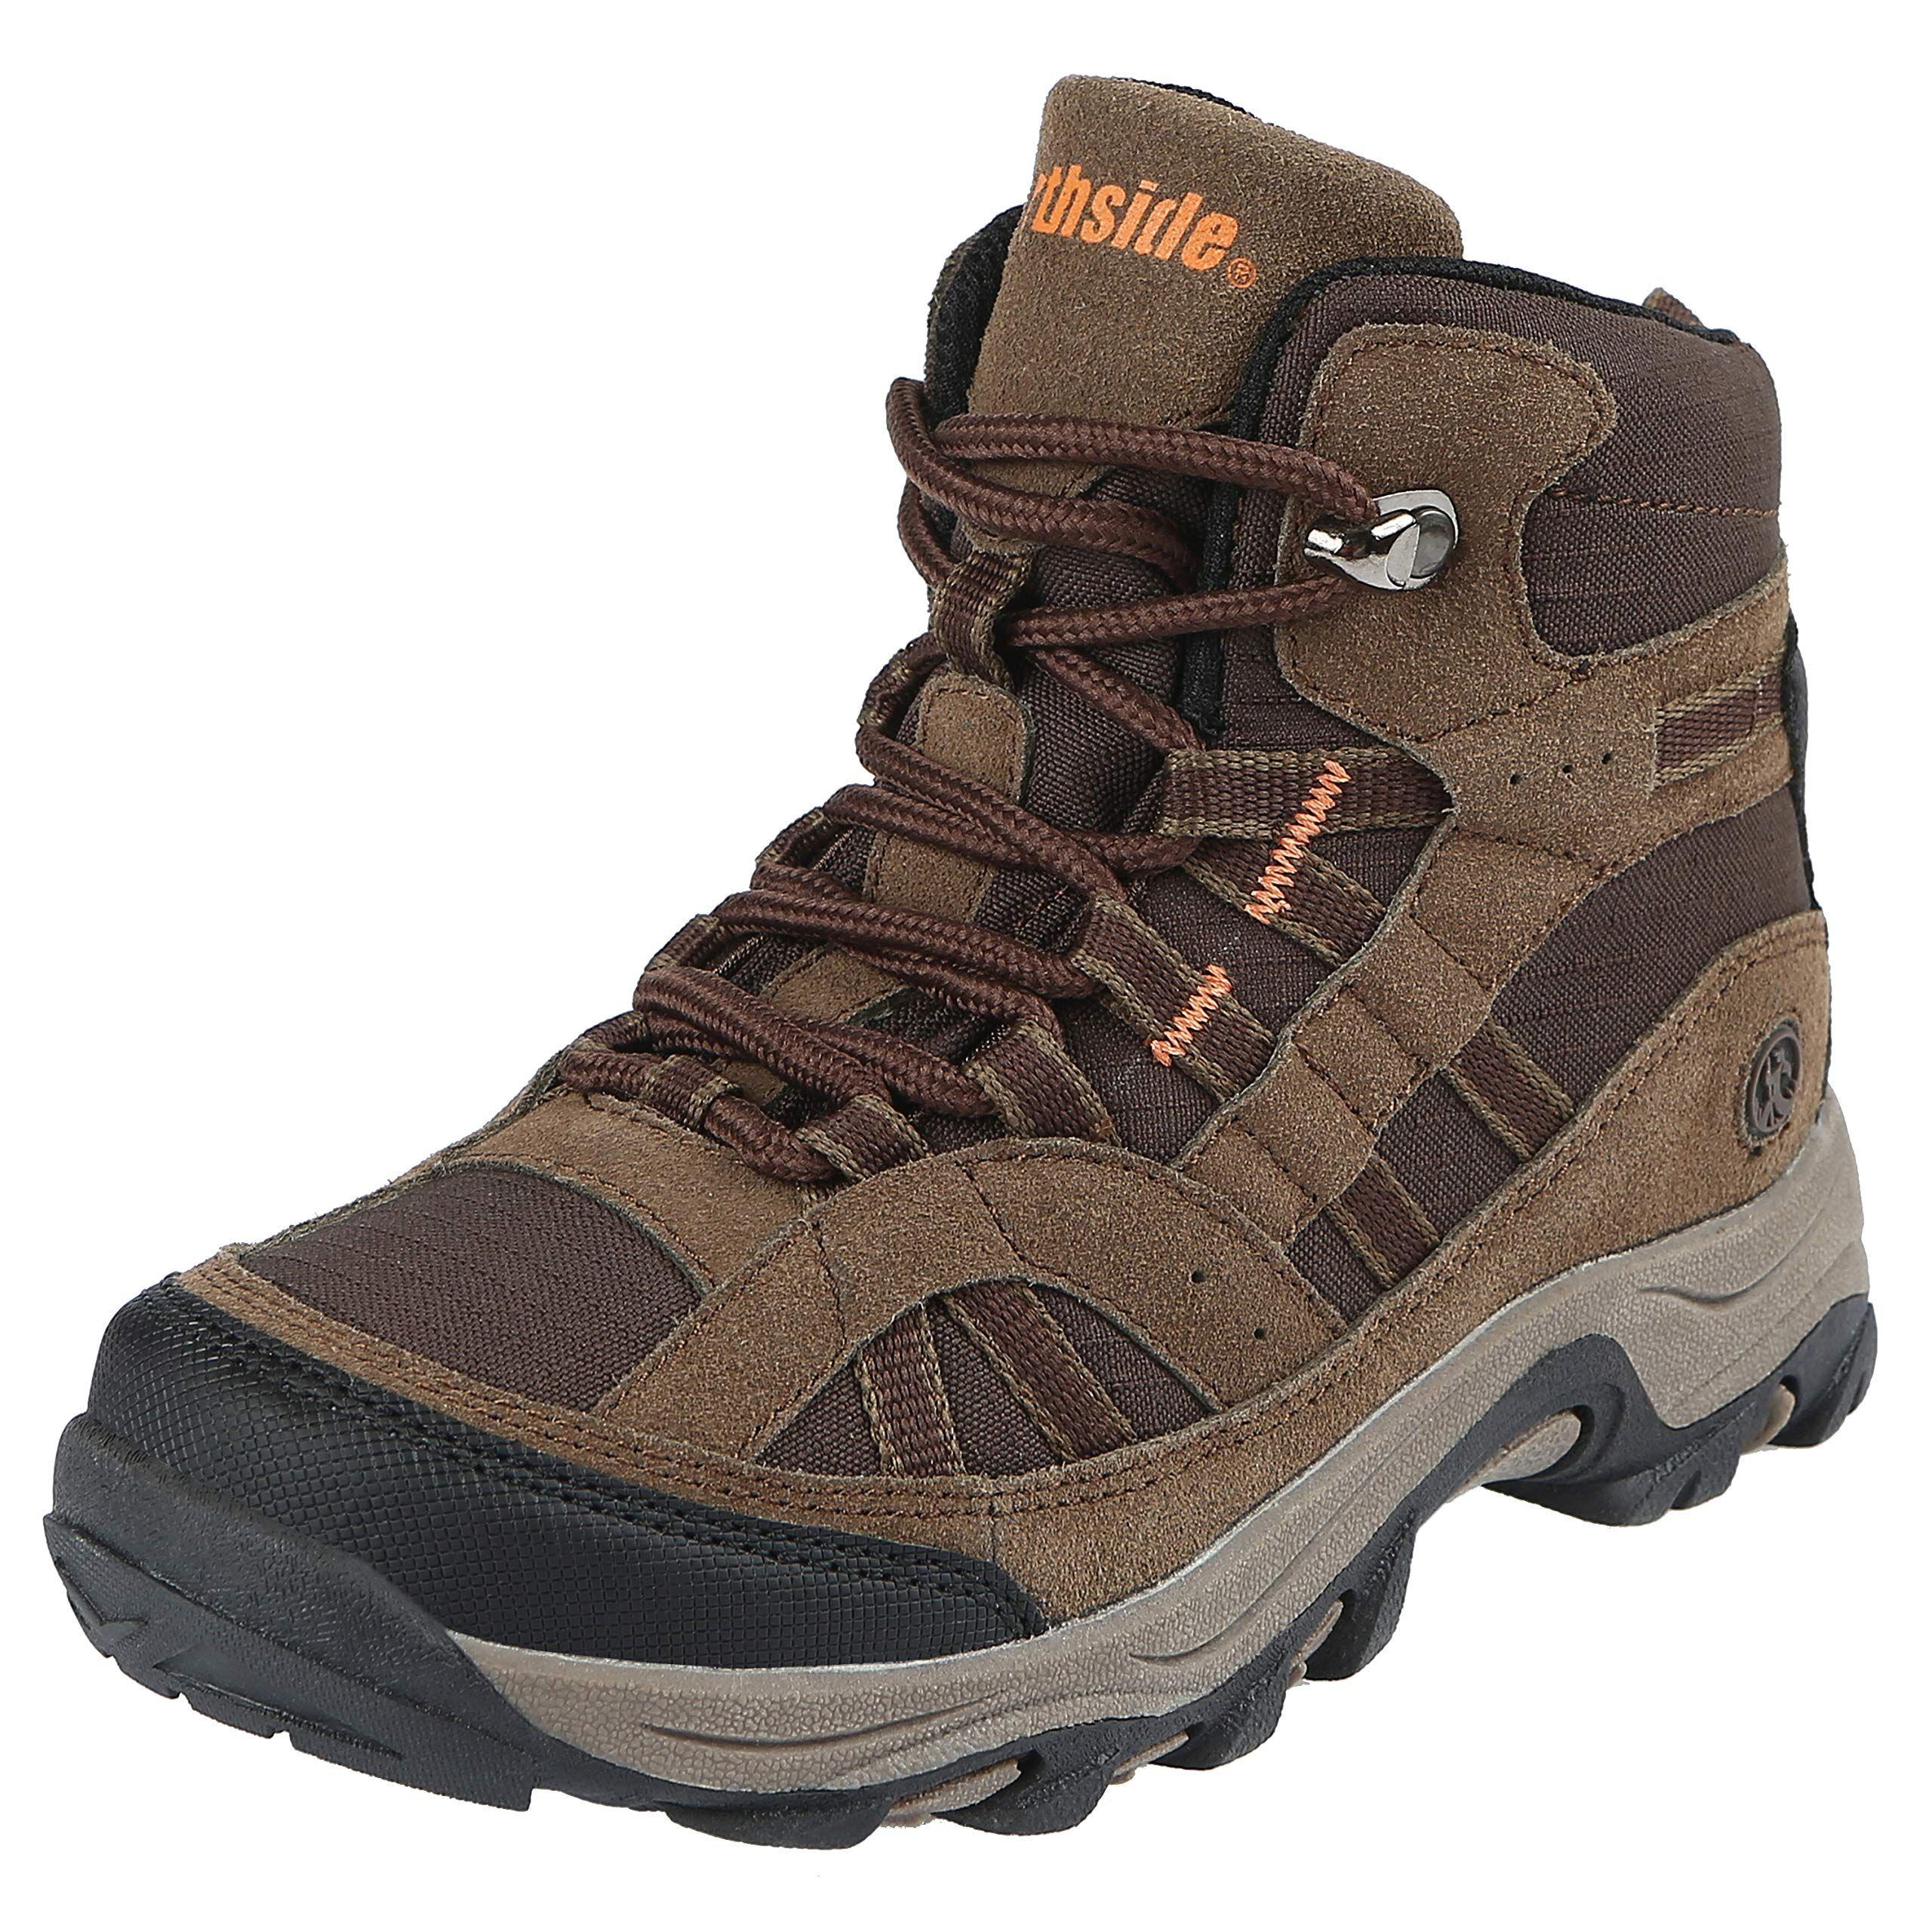 Northside Kids' Rampart Mid Hiking Boot